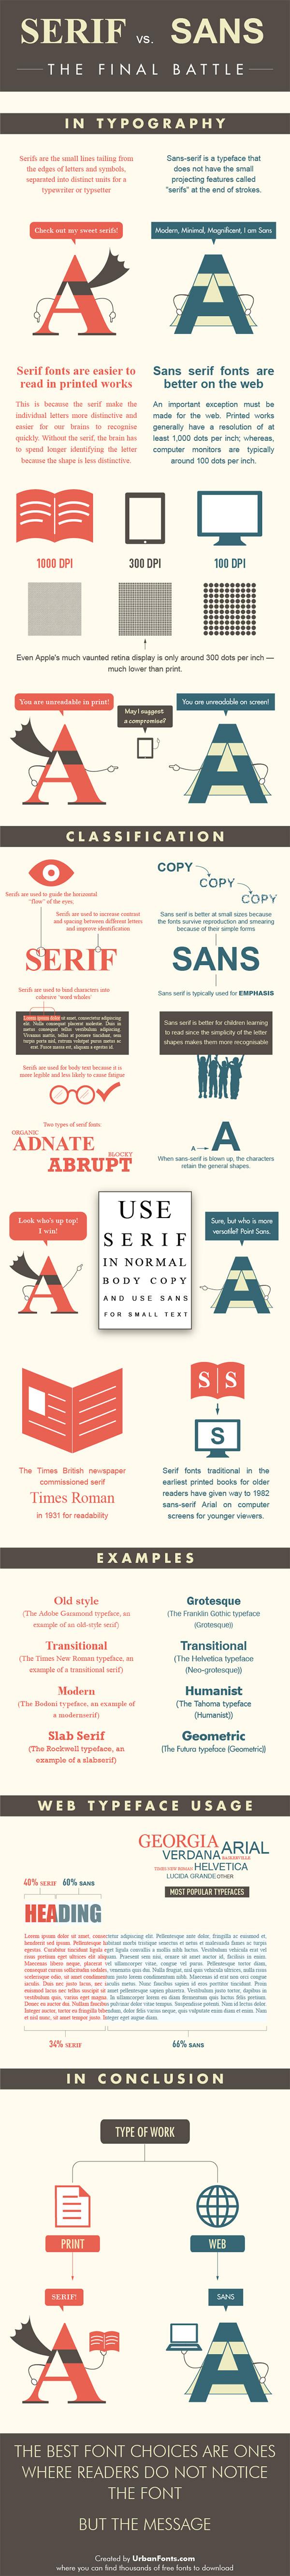 erif-vs-sans-serif